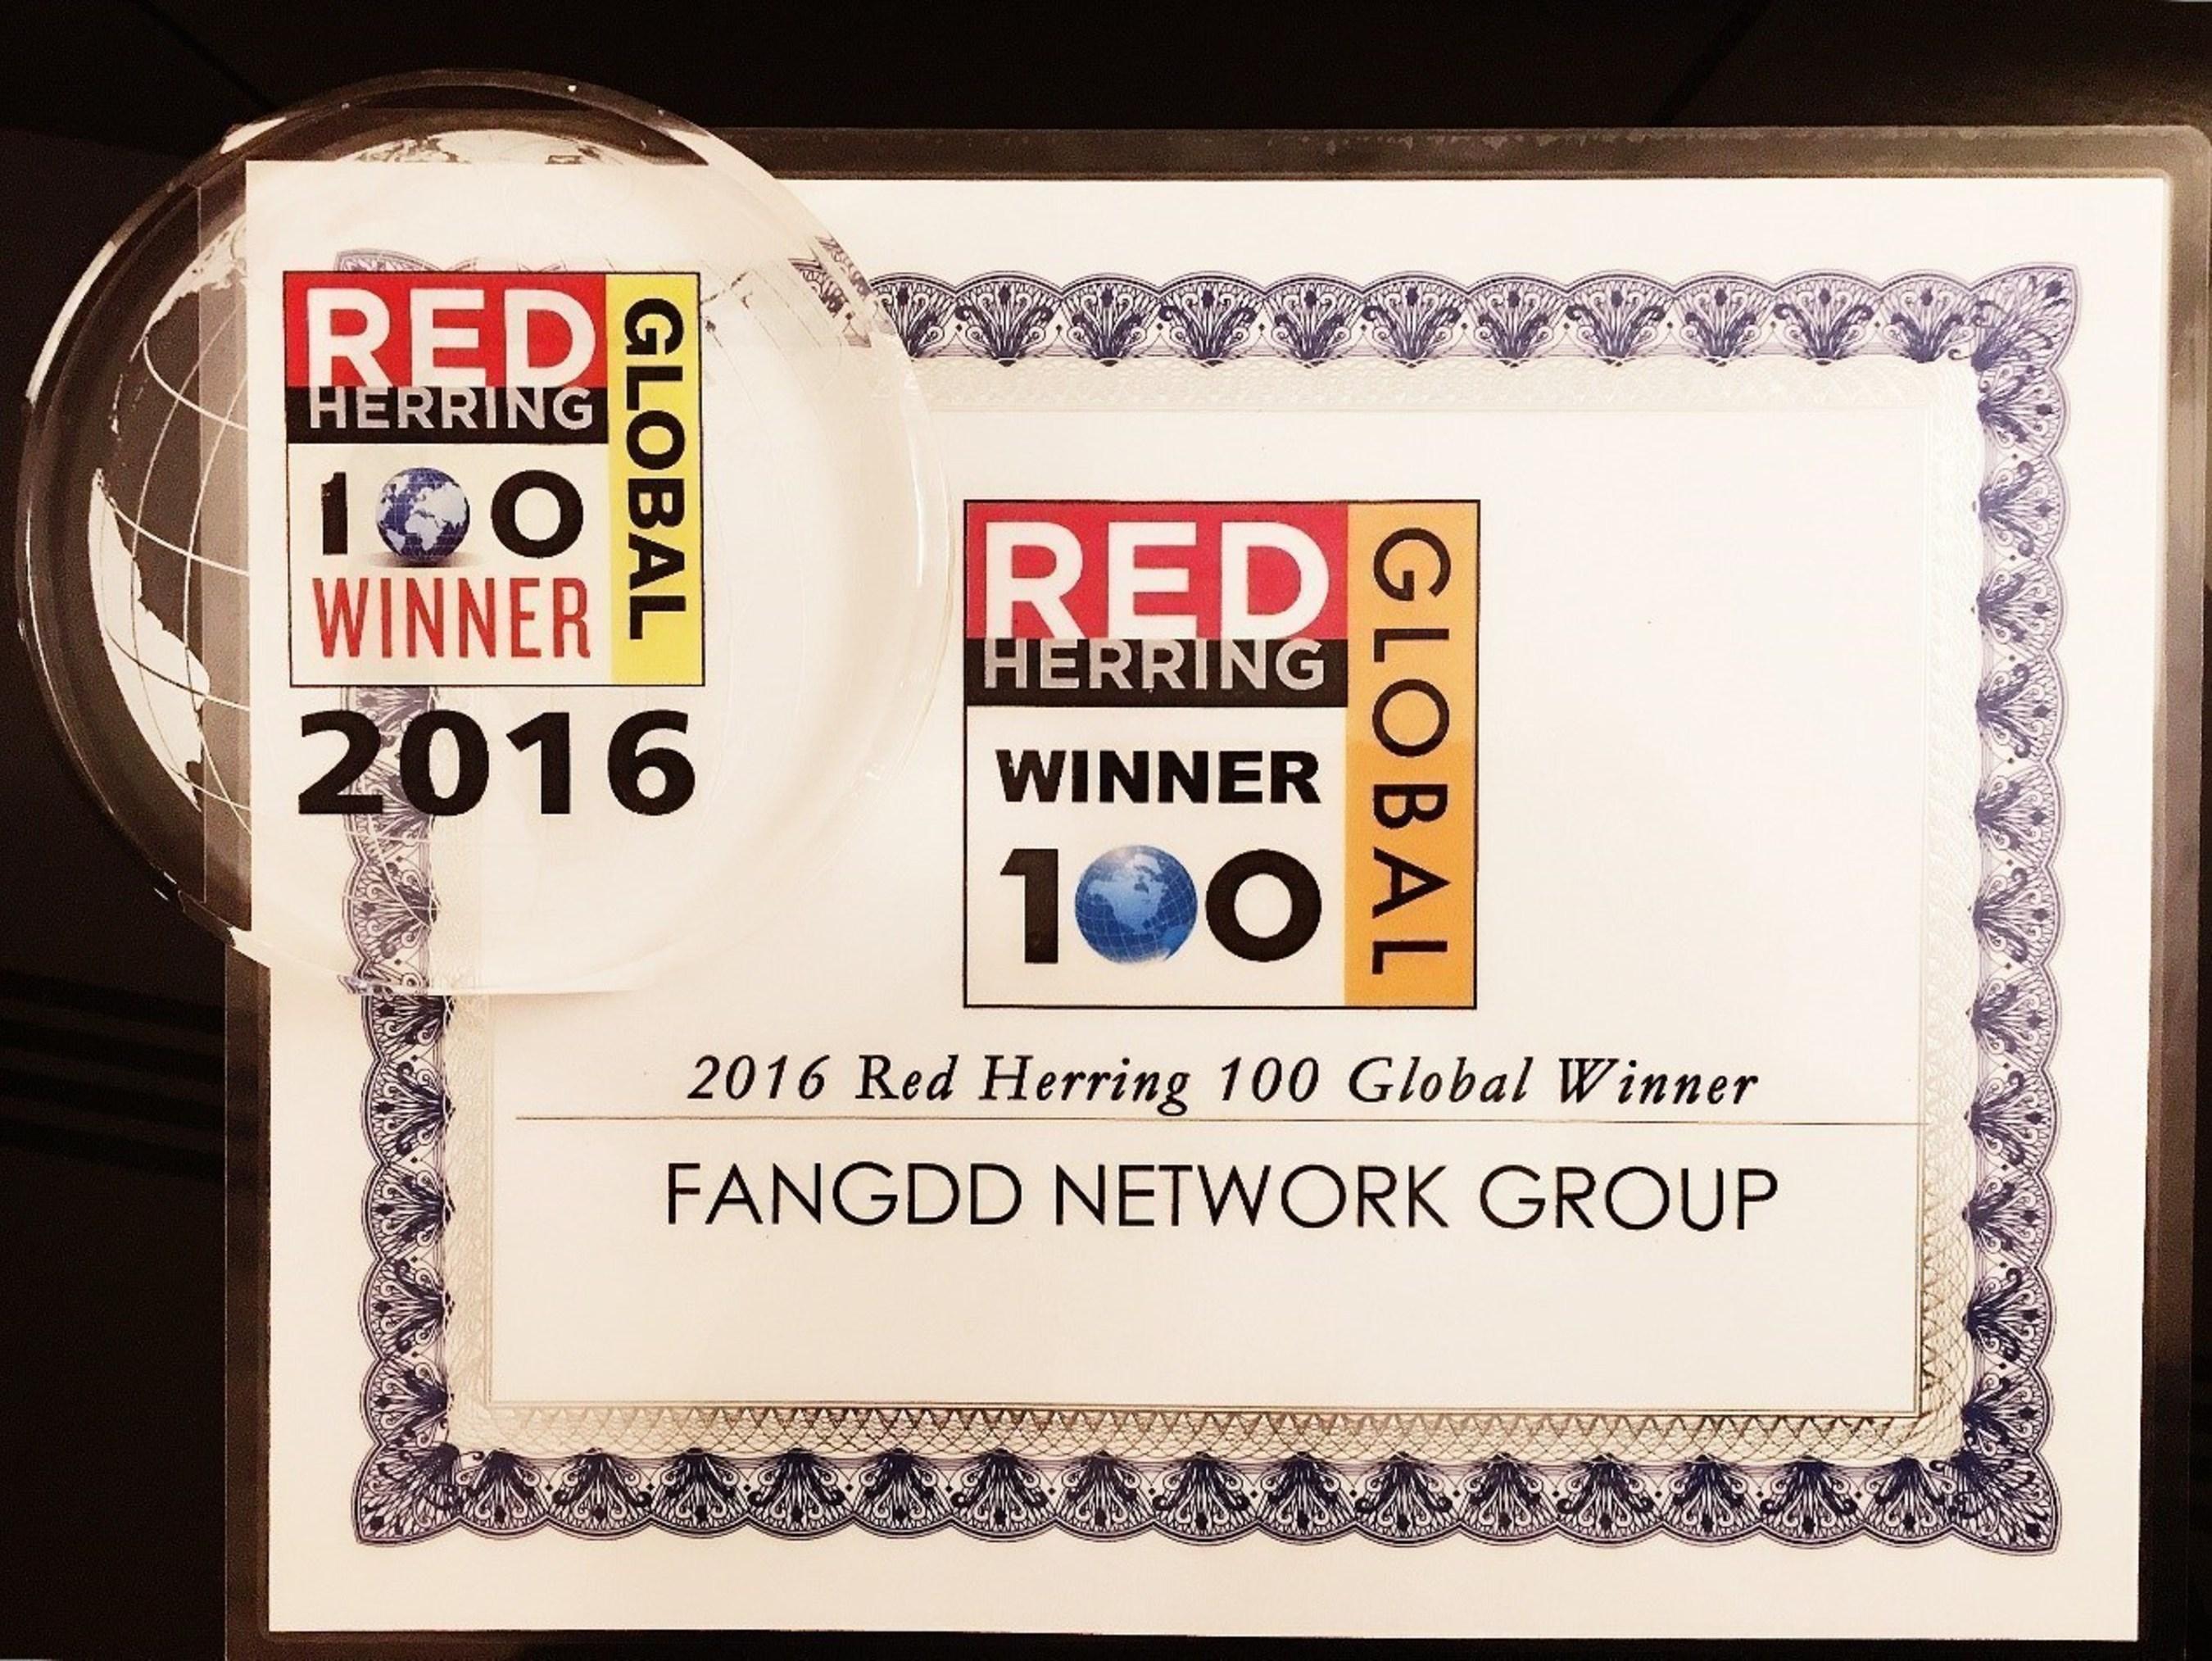 FangDuoDuo Wins 2016 Red Herring Global Top 100 Award